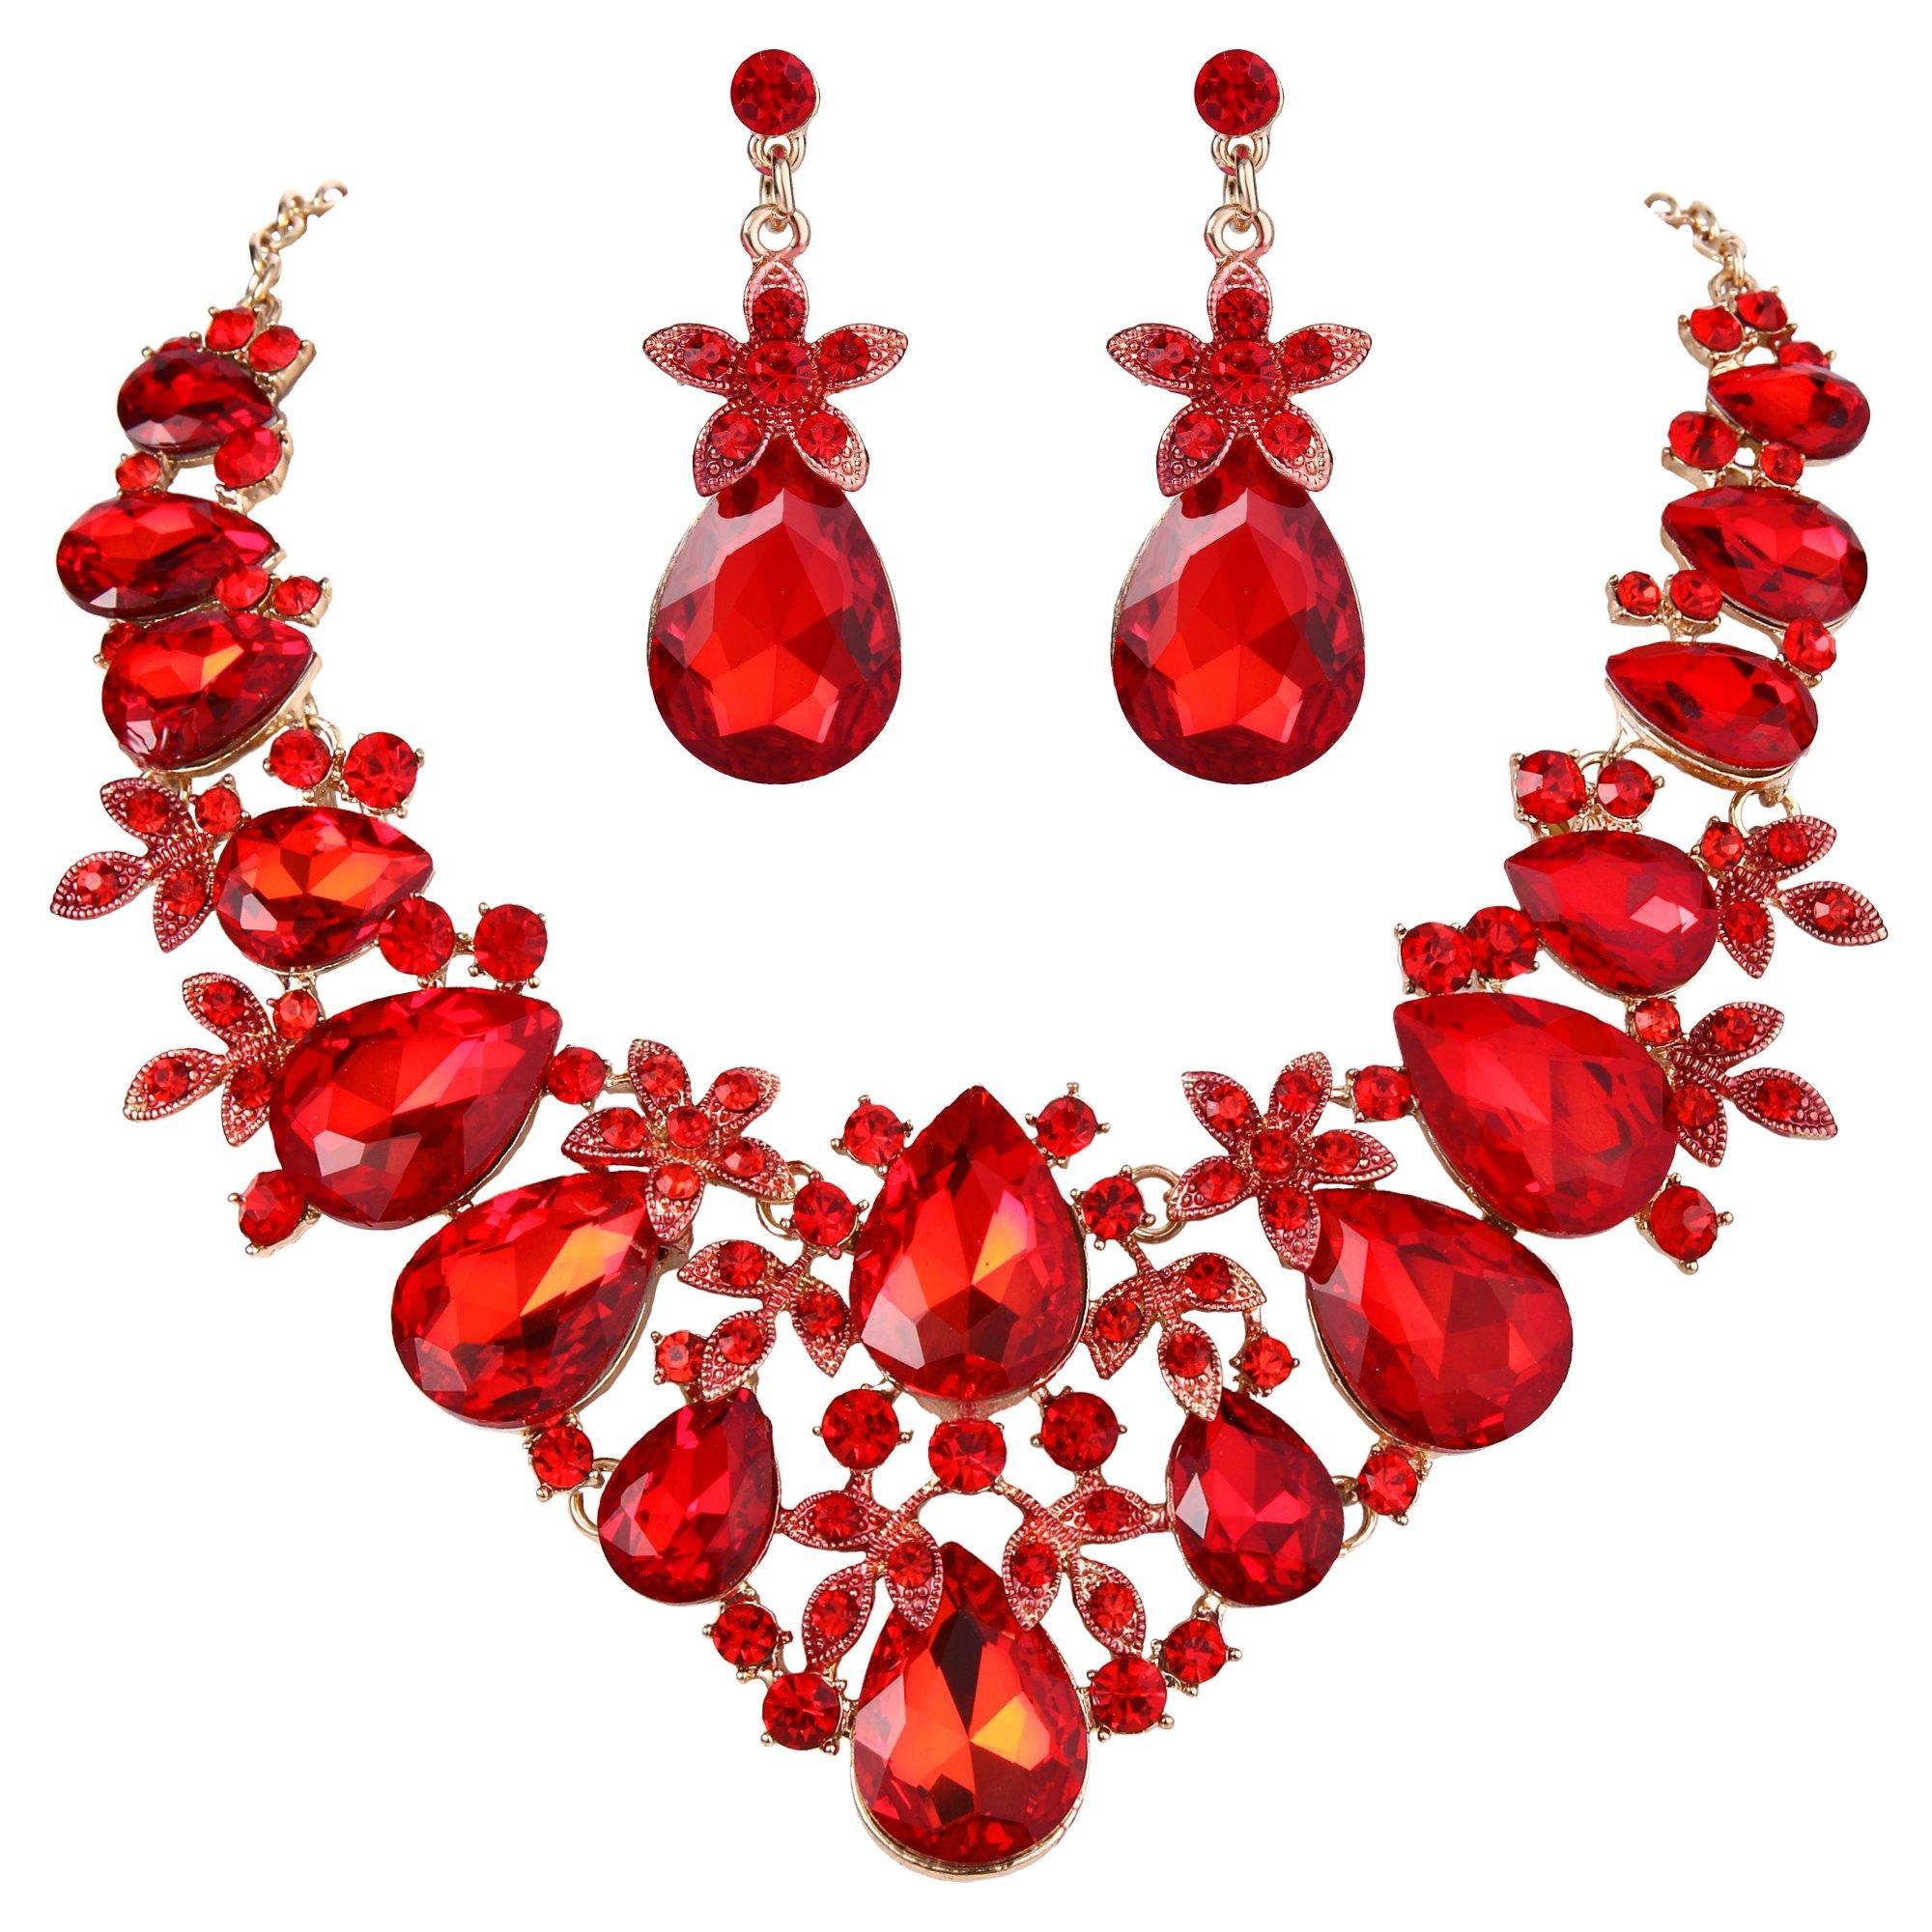 BriLove Women's Bohemian Boho Crystal Flower Leaf Vine Teardrop Statement Necklace Dangle Earrings Set Ruby Color Gold-Toned